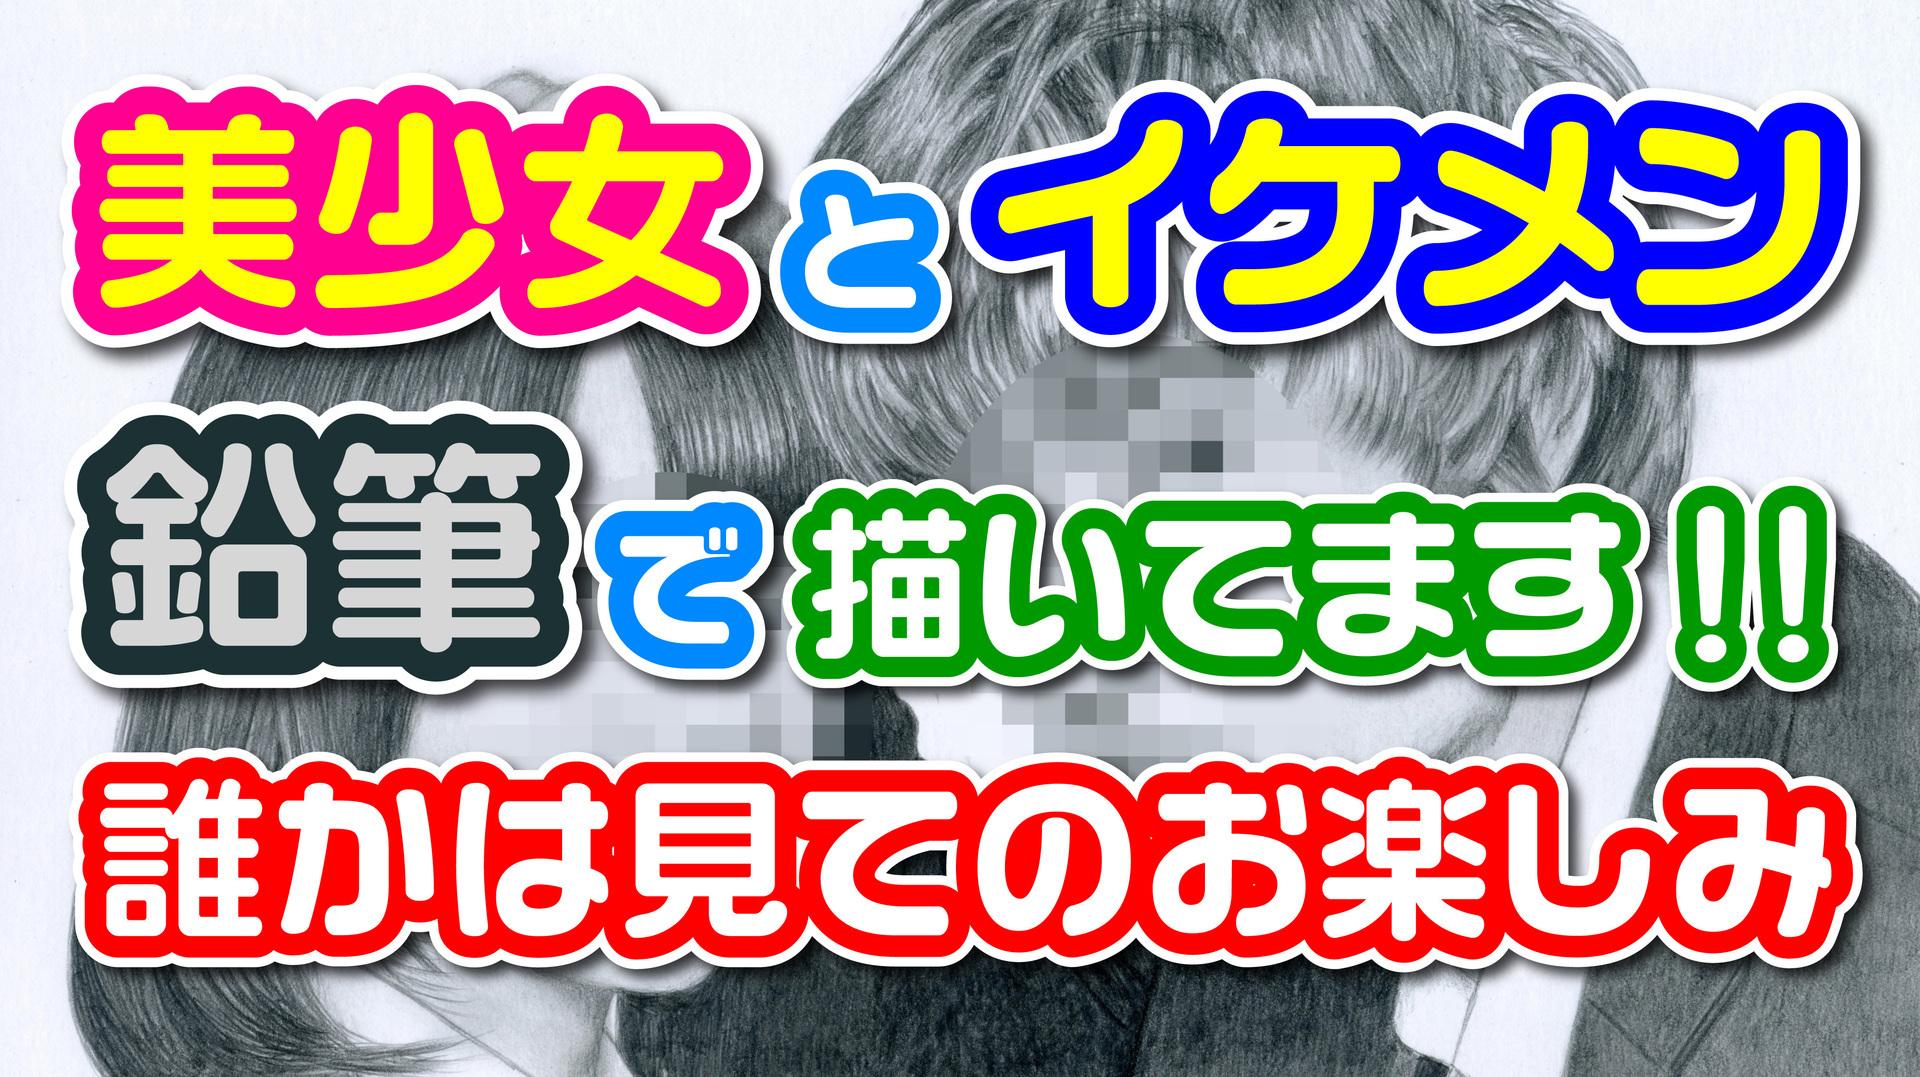 Youtubeサムネイル 山崎賢人・二階堂ふみ鉛筆画.jpg